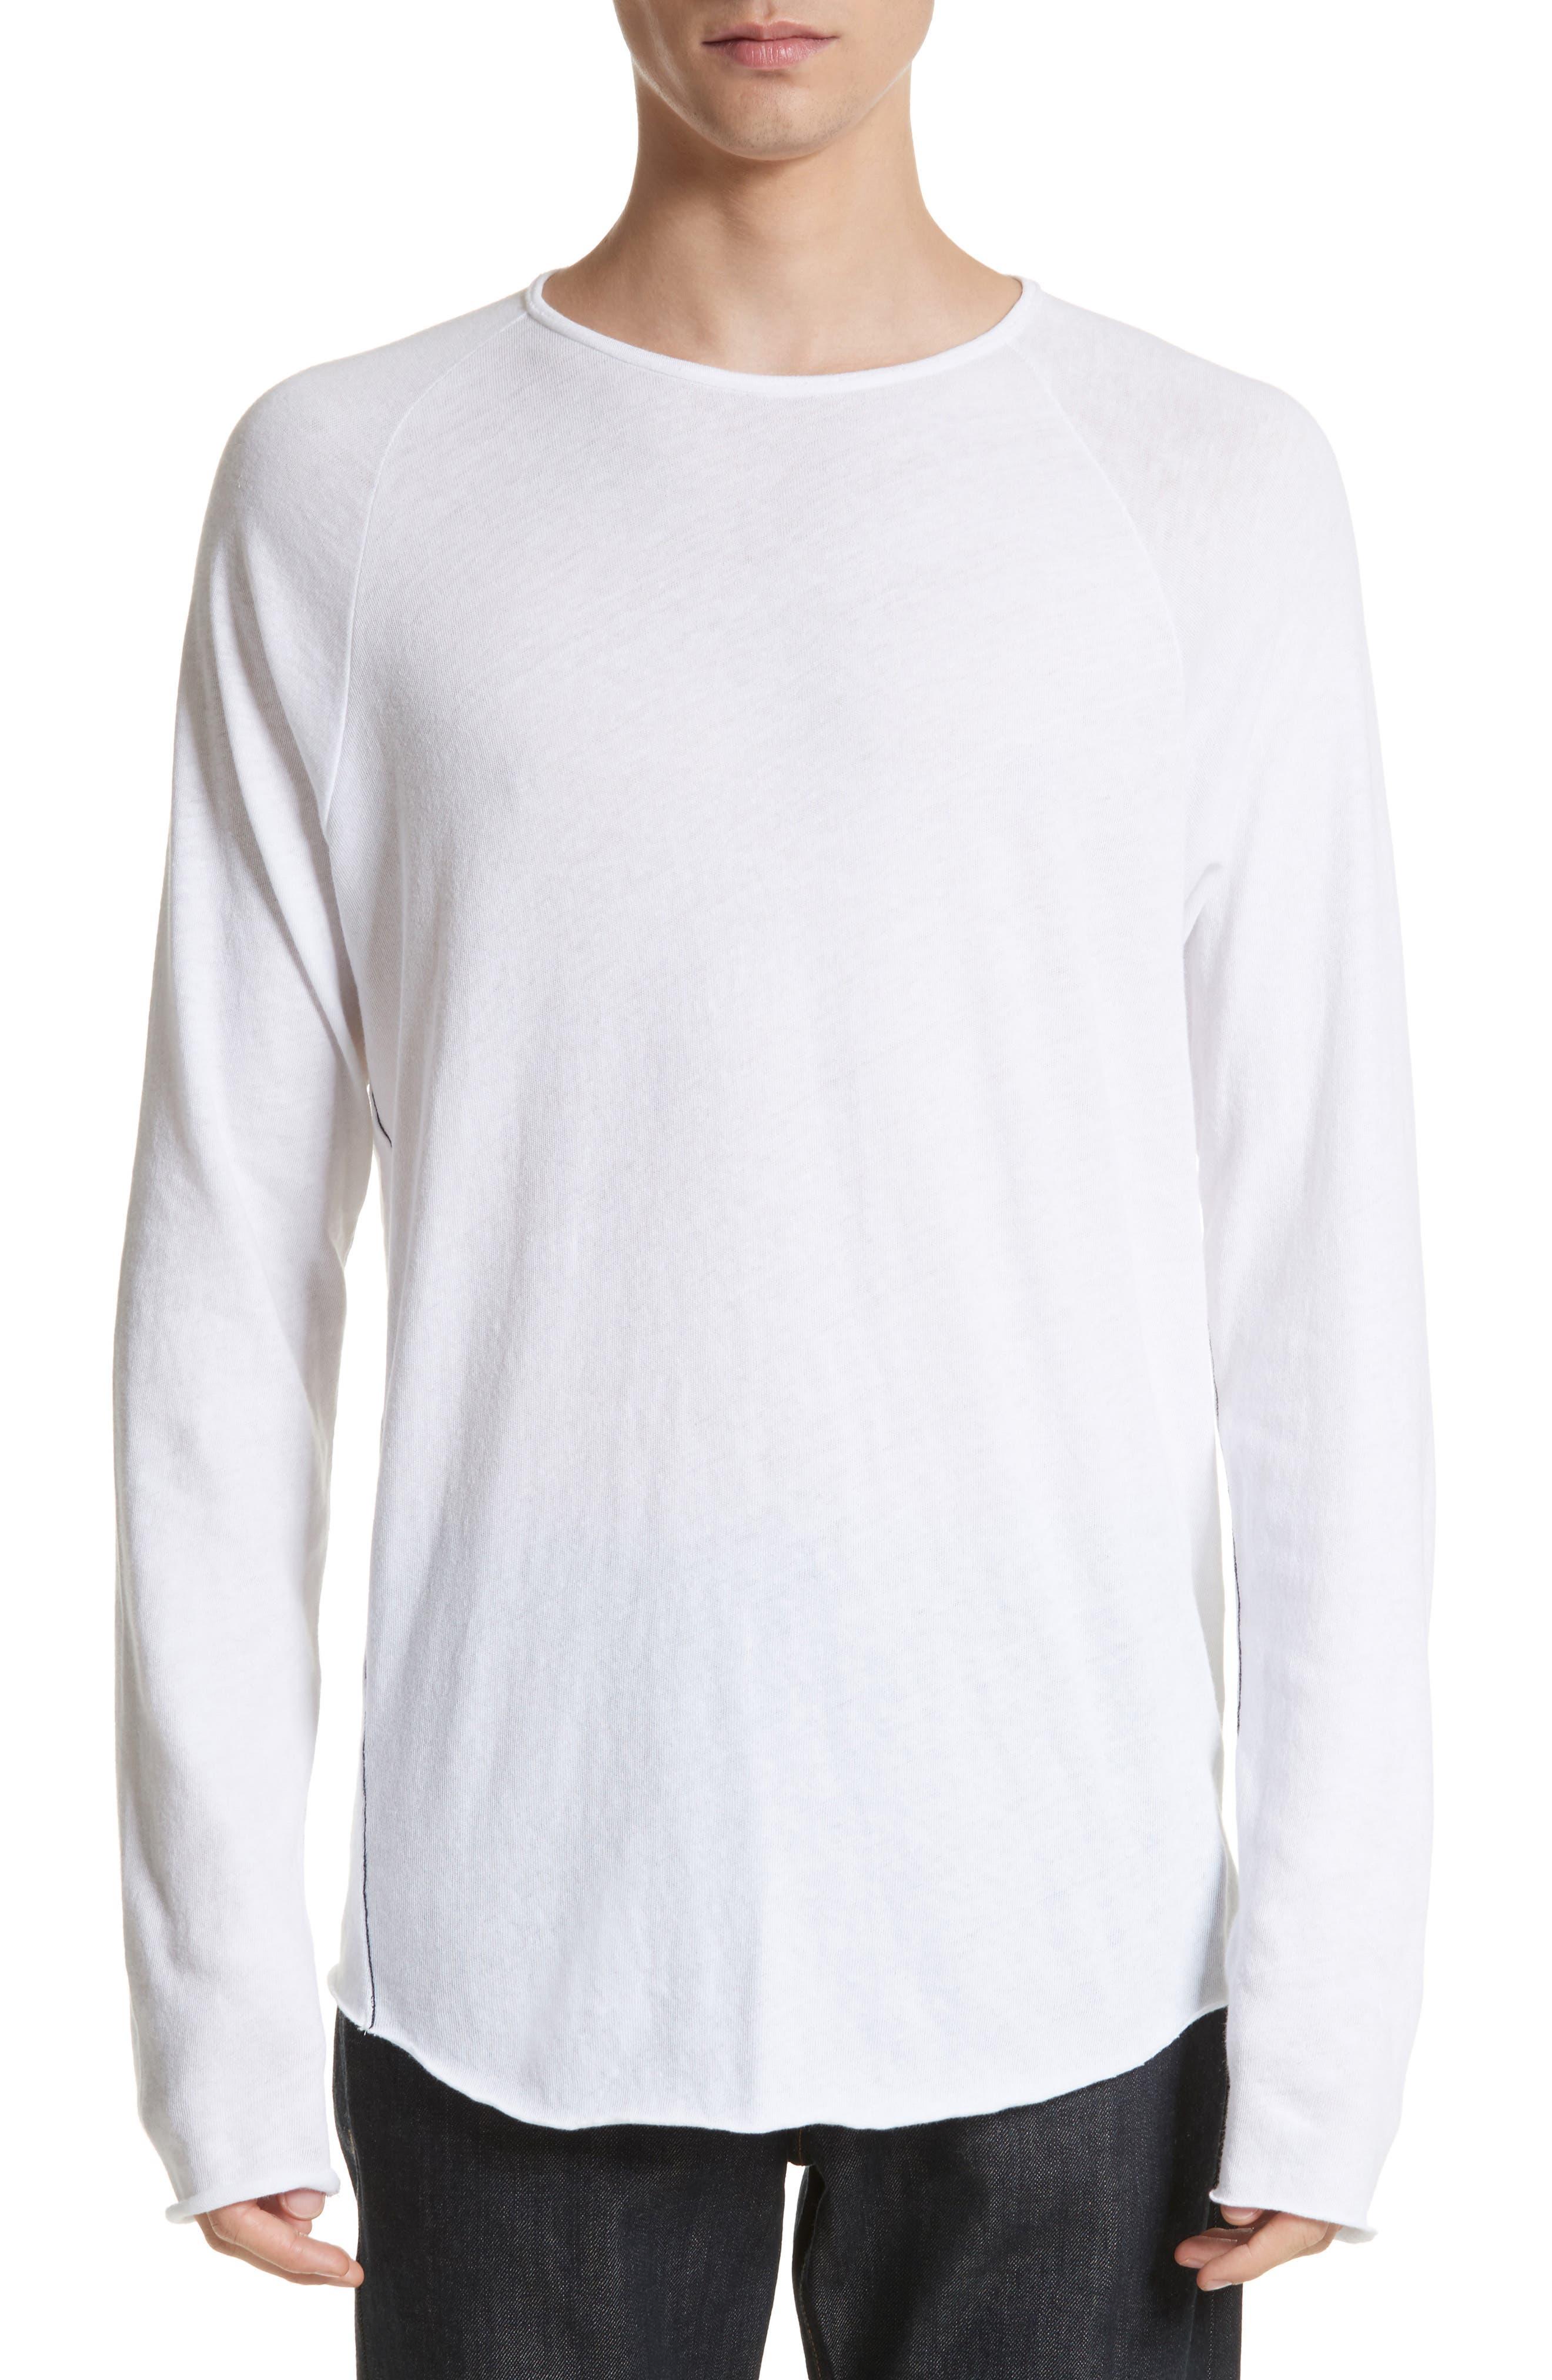 Main Image - rag & bone Rupert Long Sleeve T-Shirt